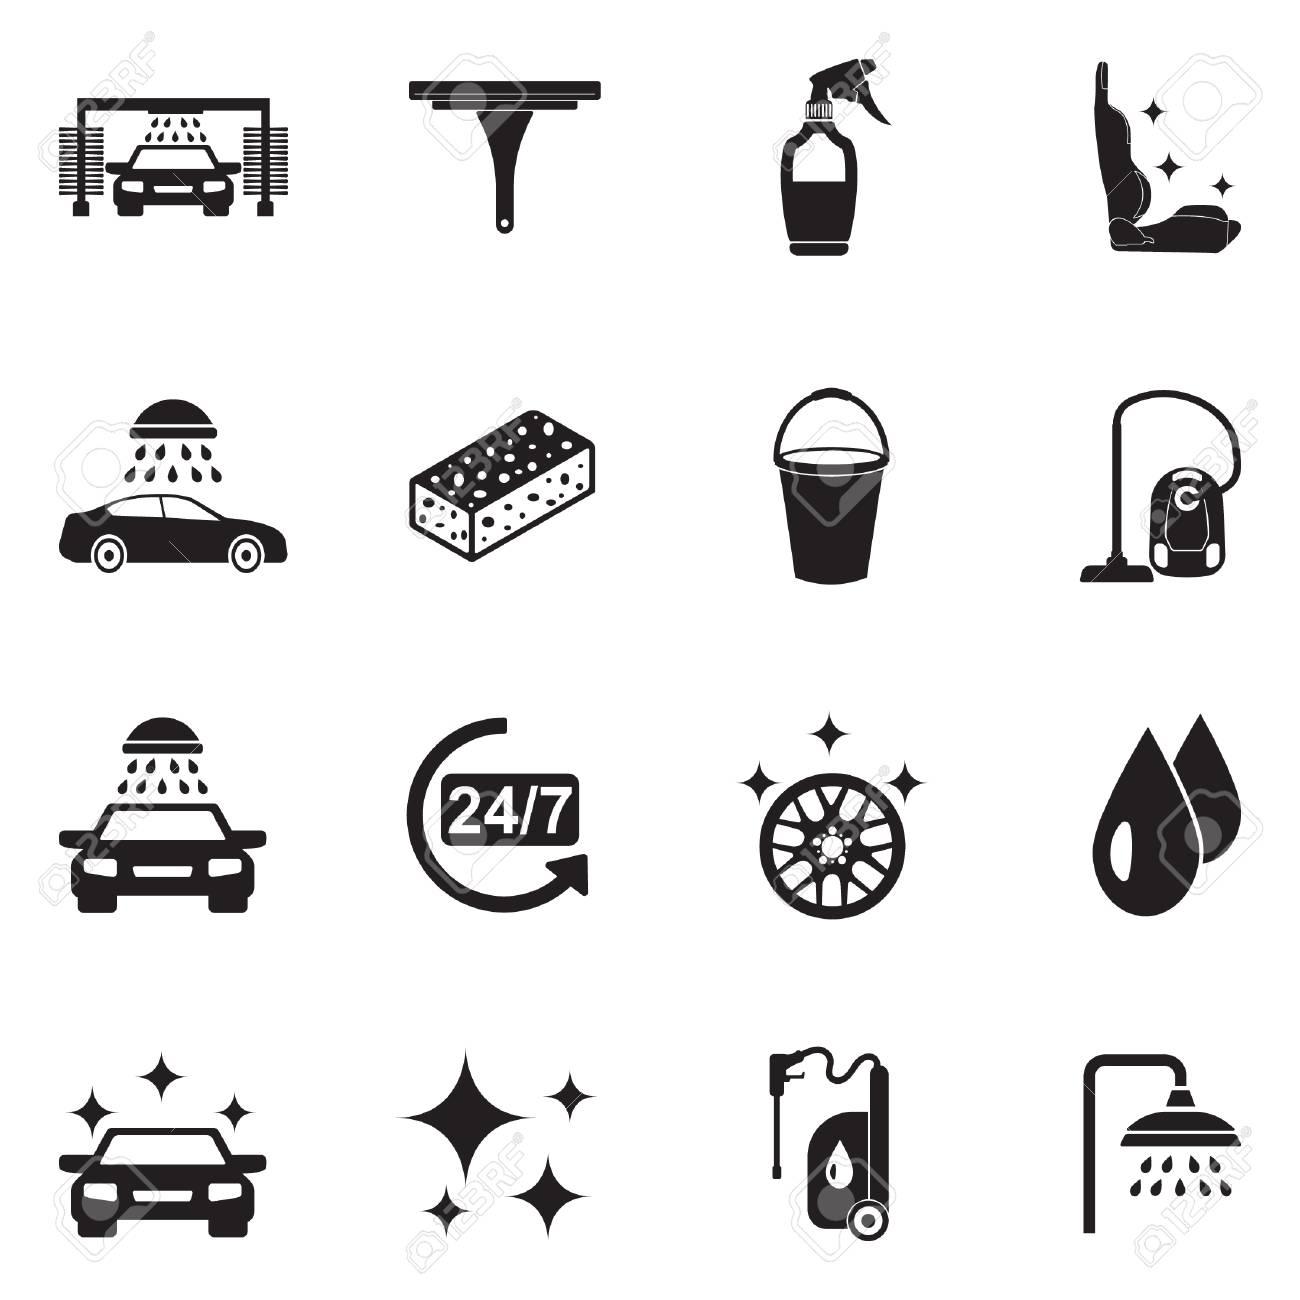 Car Wash Icons. Black Flat Design. Vector Illustration. - 106209638